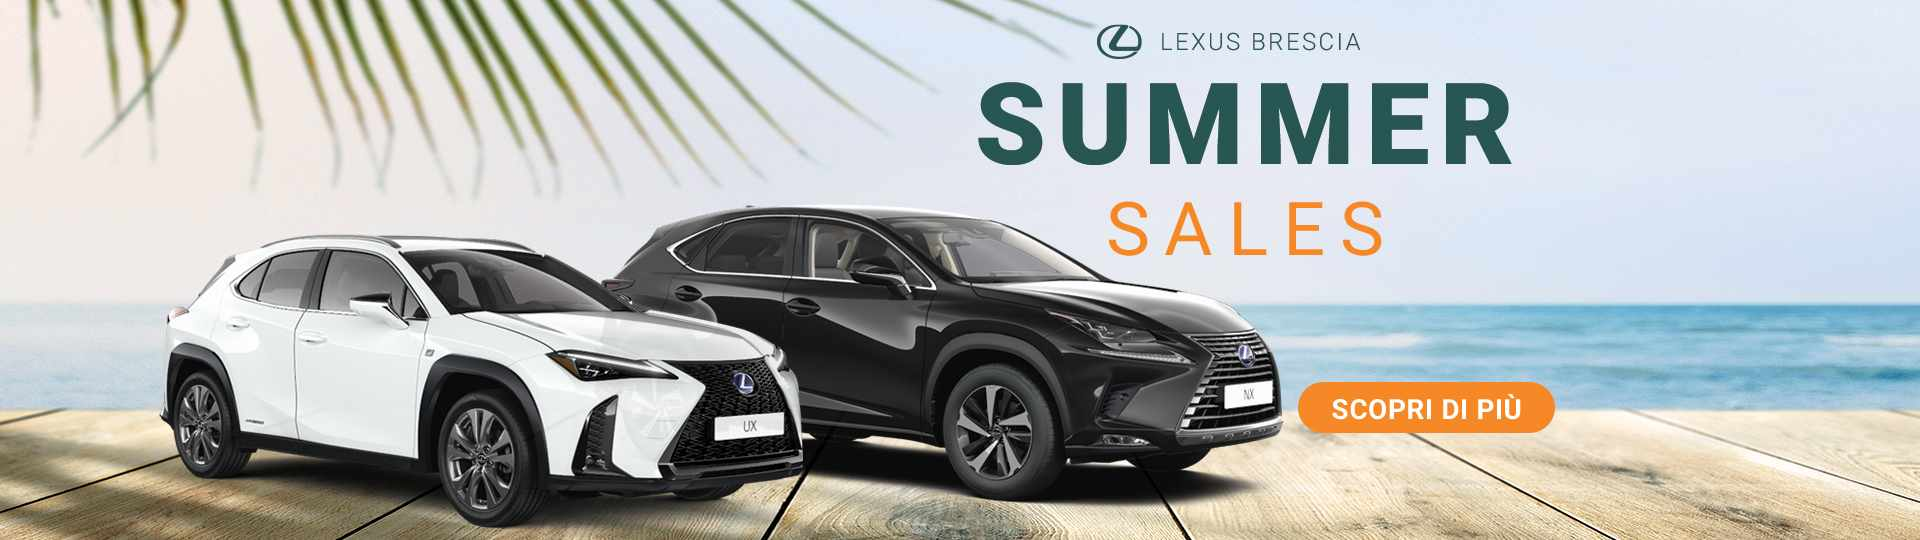 header_lexus_summer_sales_giugno_2021.jpg